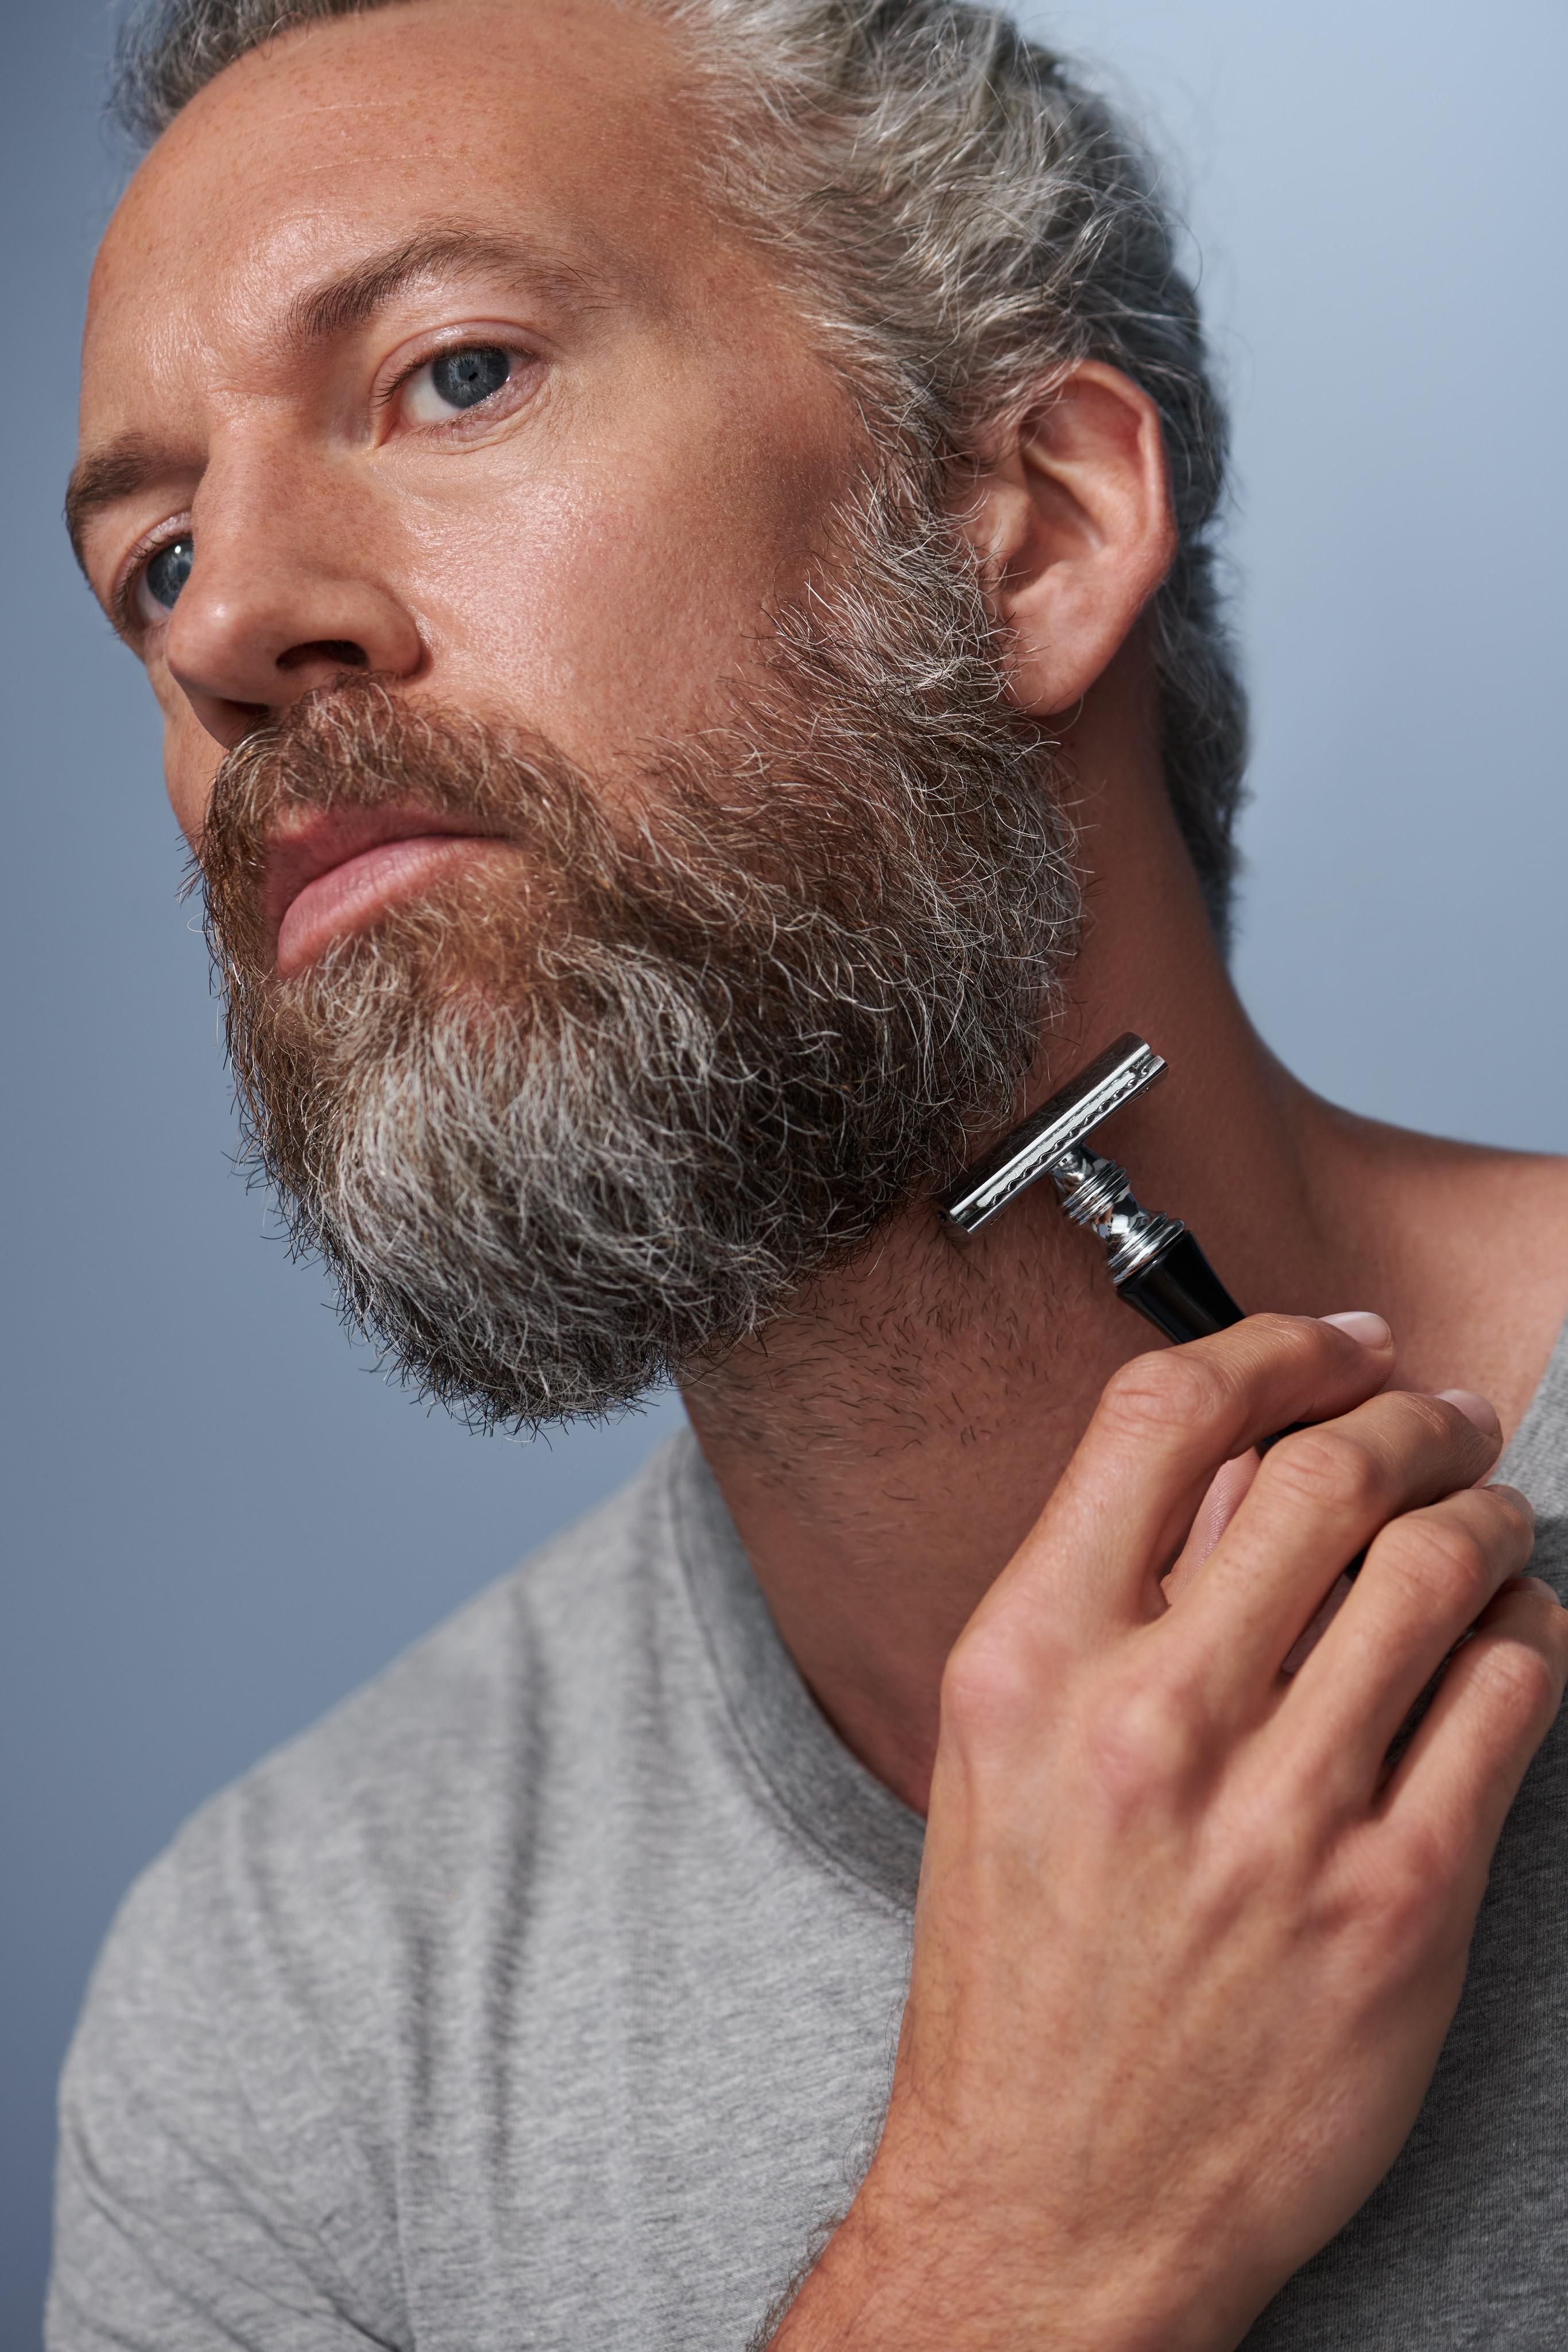 Skincare-beautyvisual-men-shaving-beard-052023-Web-Rendition